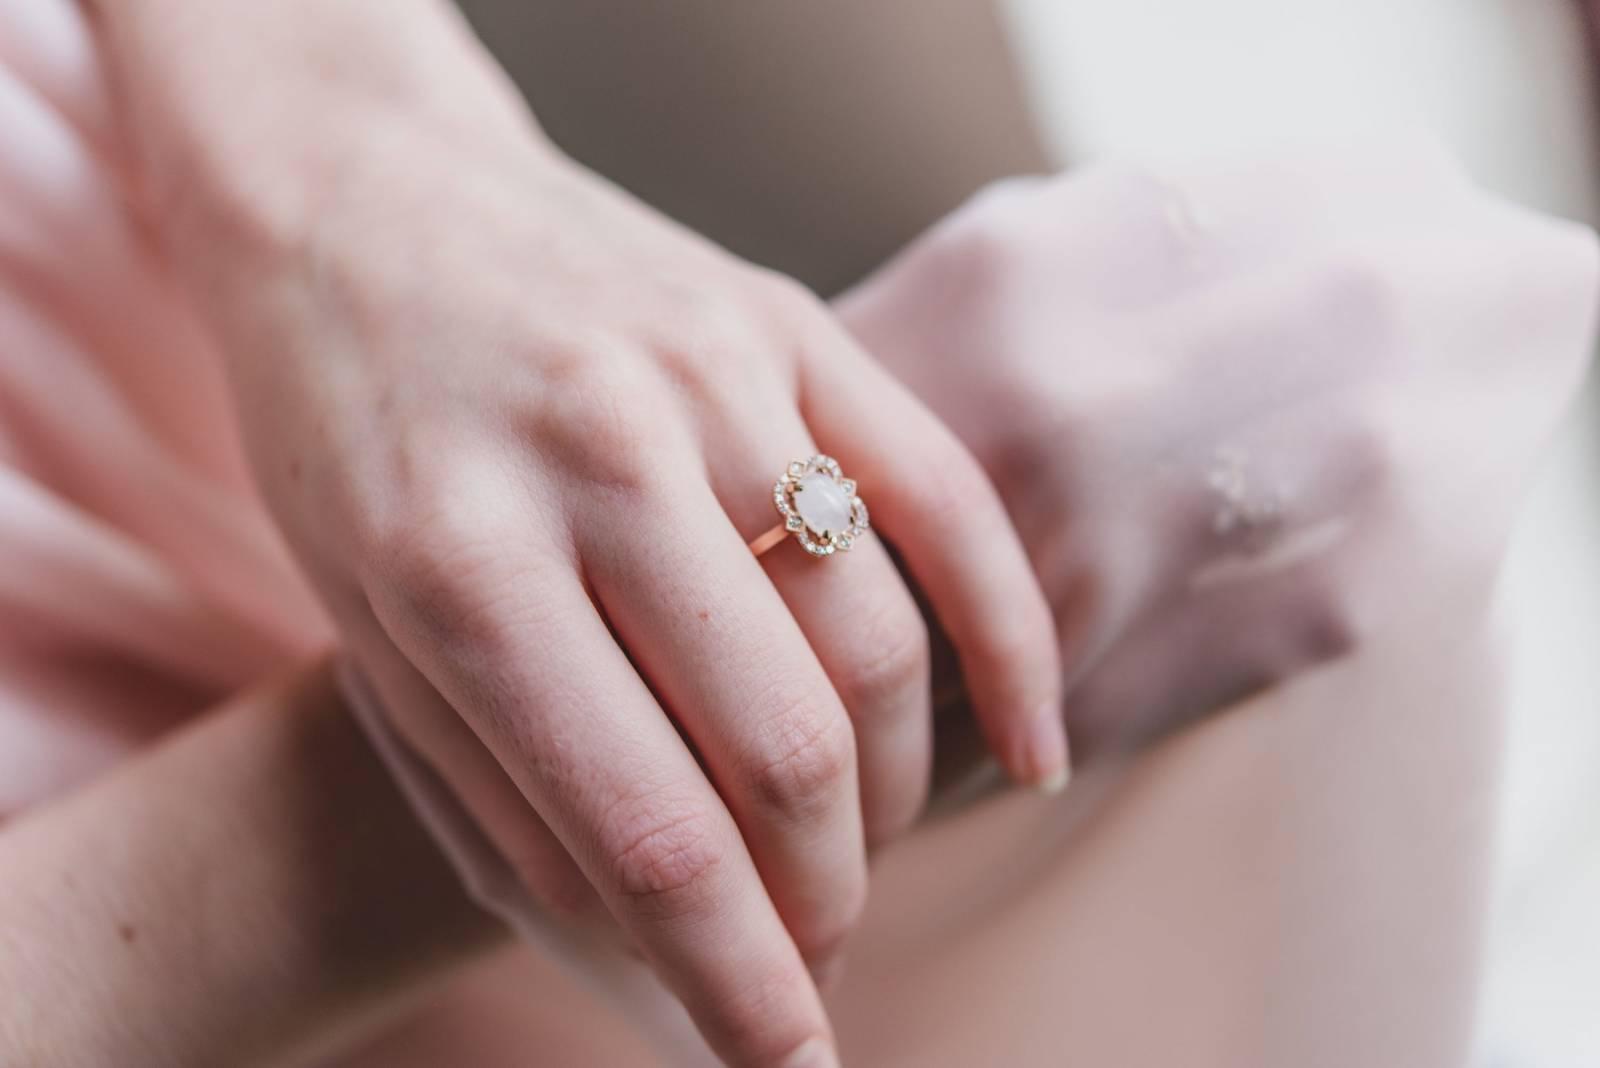 Nathalie Swinnen - Juwelen - Bruidsjuwelen - Verlovingsring - Trouwring - House of Weddings - 4